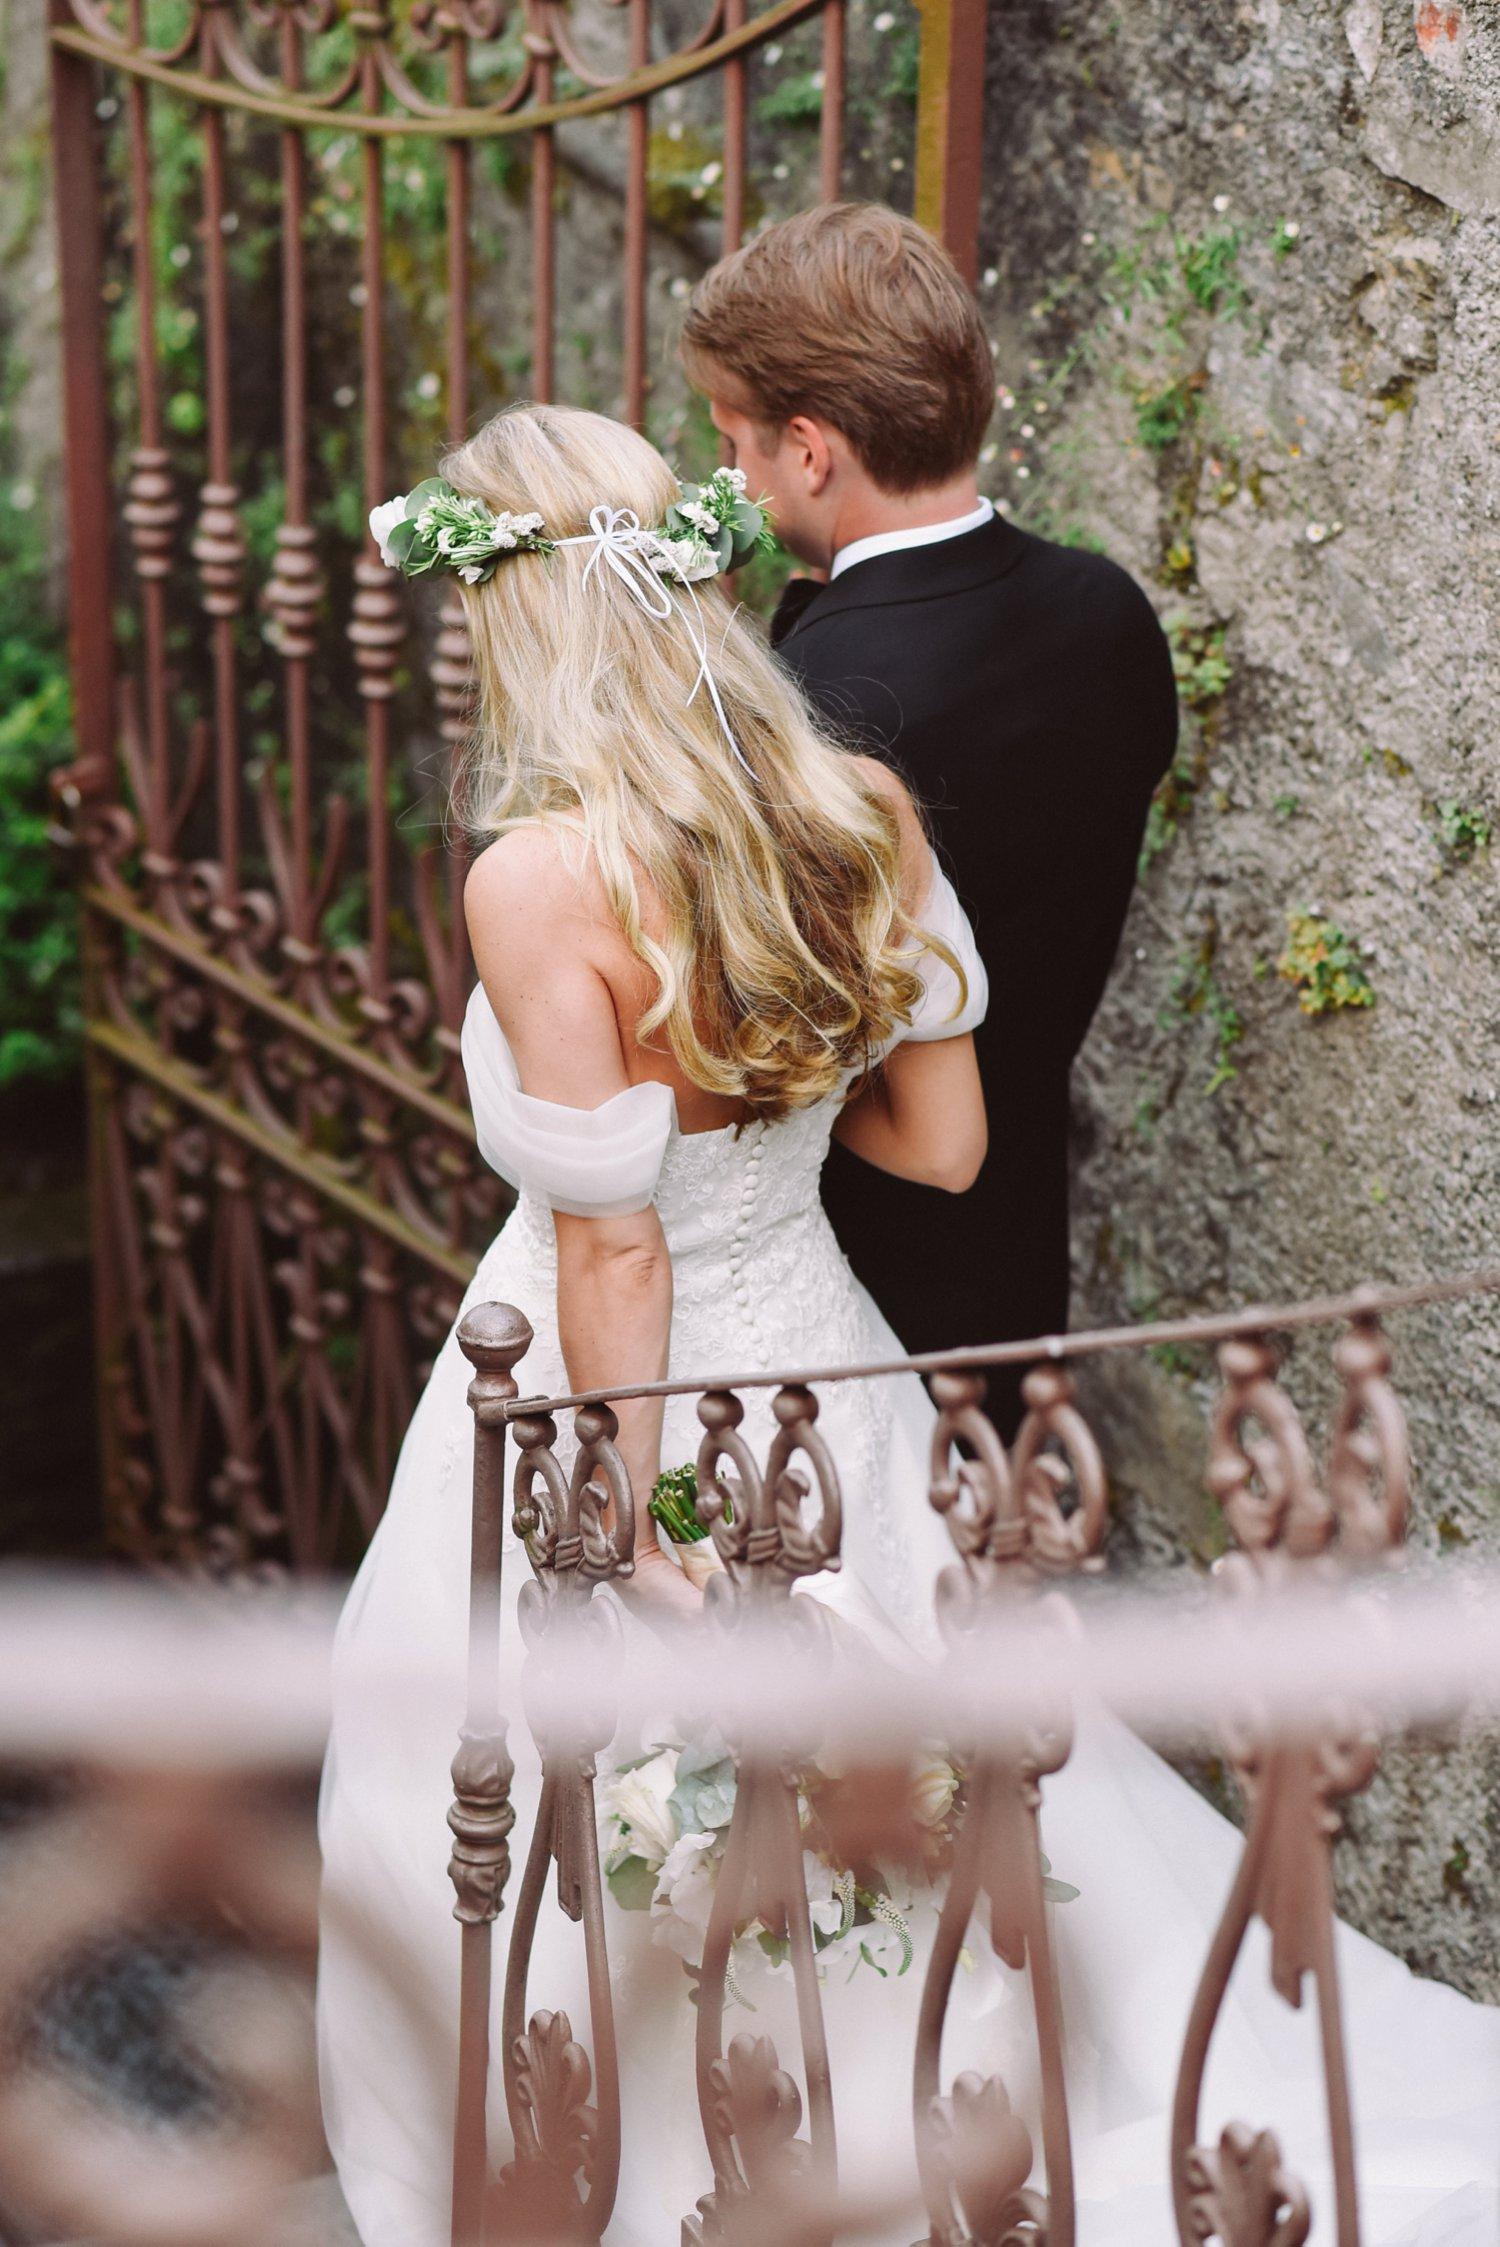 wedding-photographer-lake-como-villa-teodolinda_0097.jpg